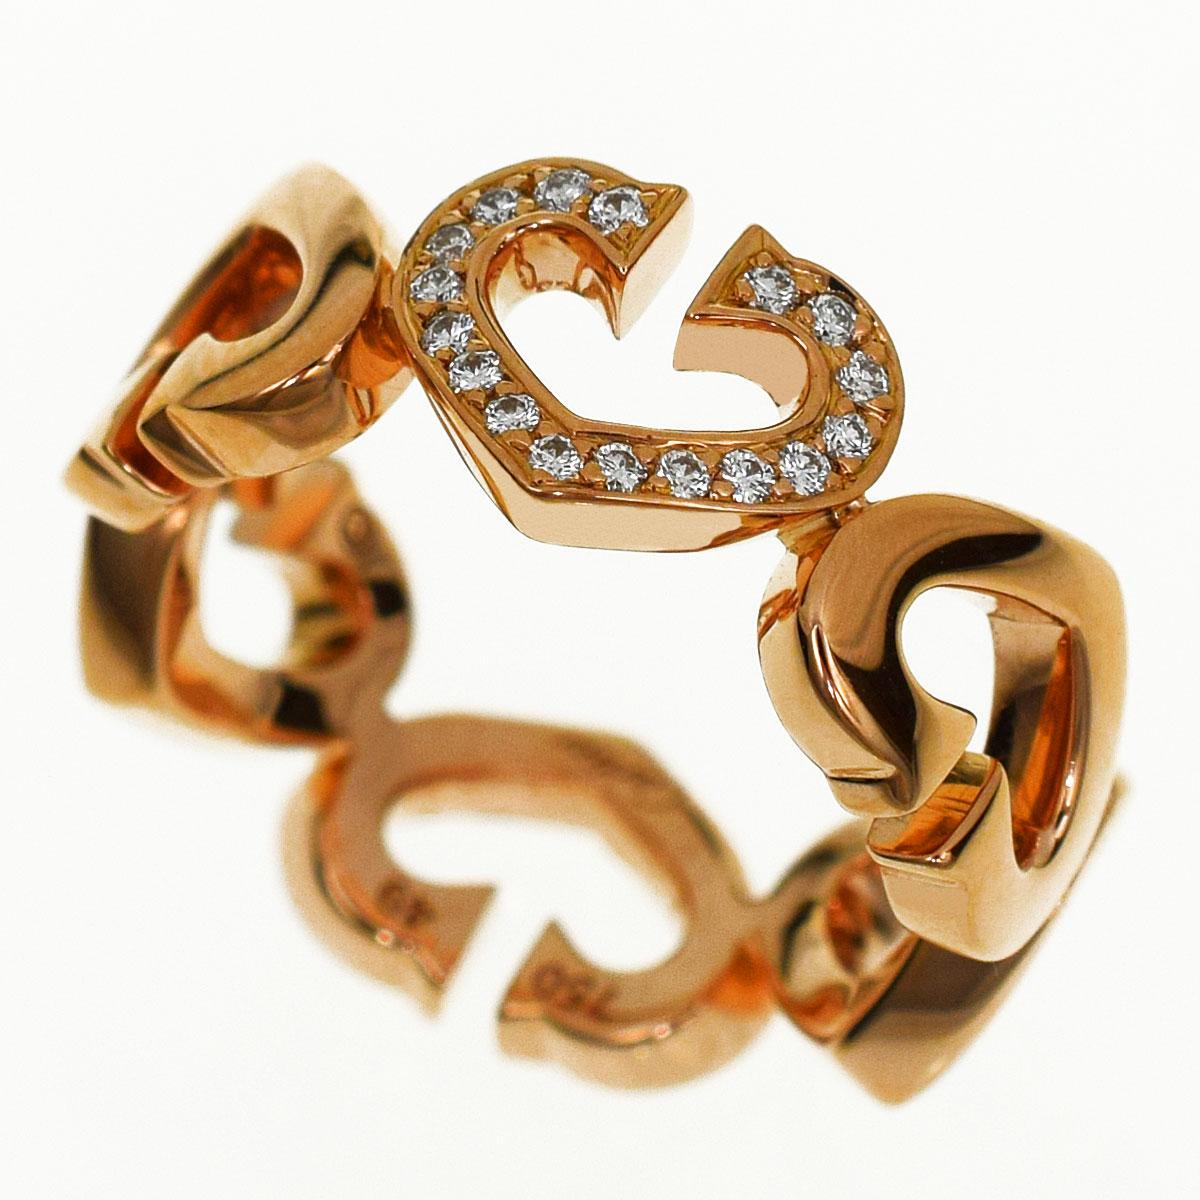 Cartier カルティエ ダイヤ Cハート オブ カルティエ 750 K18 PG ピンクゴールド 日本サイズ約9号 #49【送料無料】【代引き手数料無料】指輪 レディース ハート&シンボル【中古】31060101